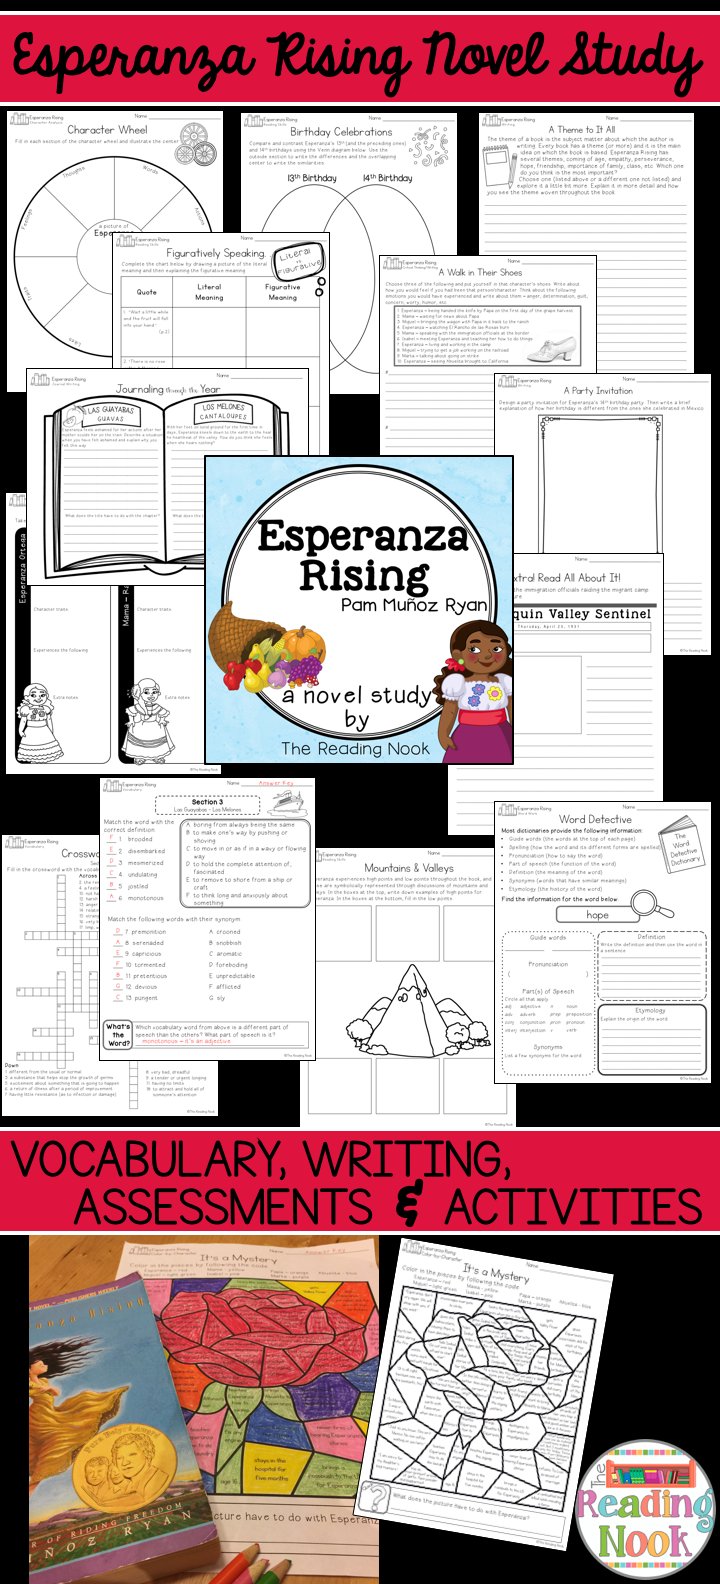 worksheet Esperanza Rising Vocabulary Worksheets esperanza rising novel study novels literacy and language arts complete including vocabulary writing reading skills assessments